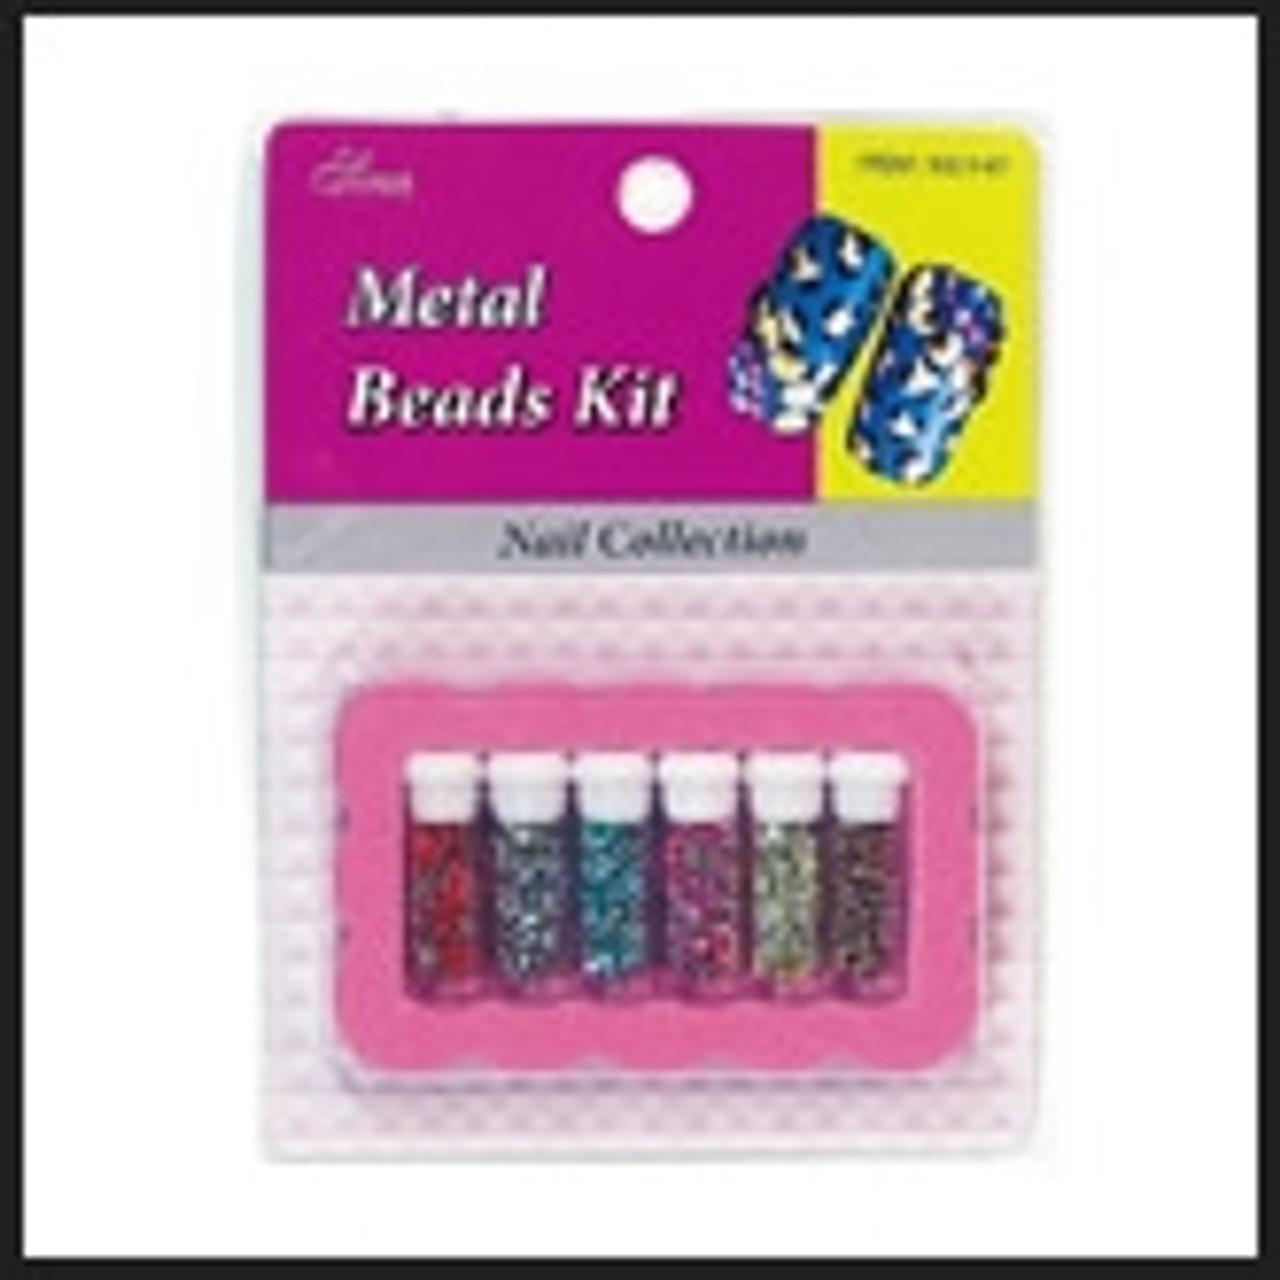 Metallic Elements, Foil, Beads, Etc.